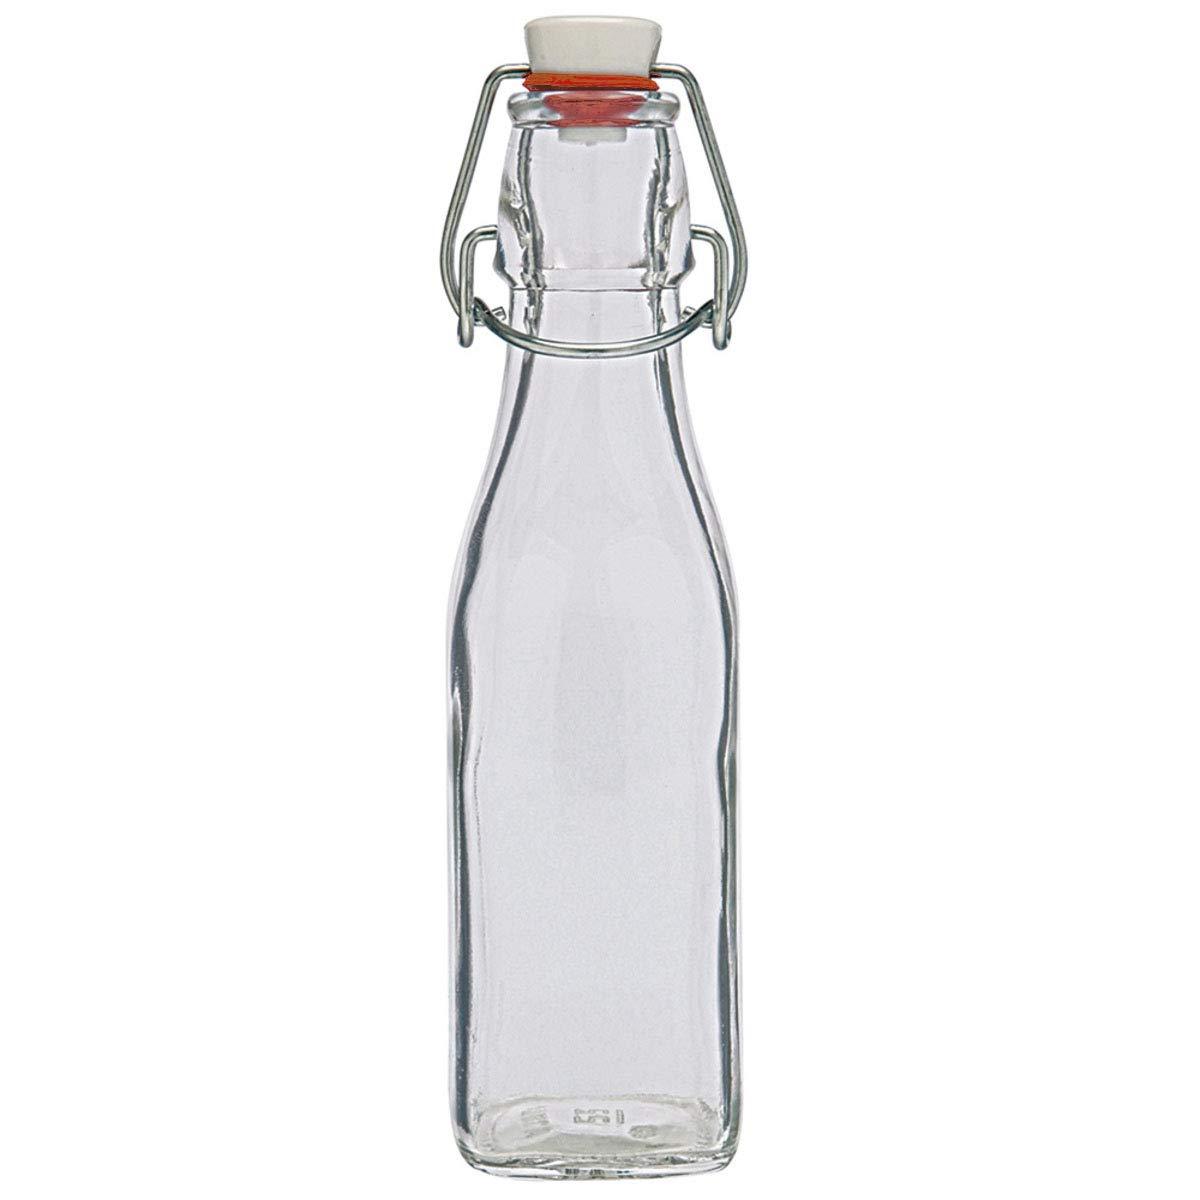 con Anillo de Goma 500 ml Lauf des Lebens Botella de Cristal con Cierre de Clip herm/ética